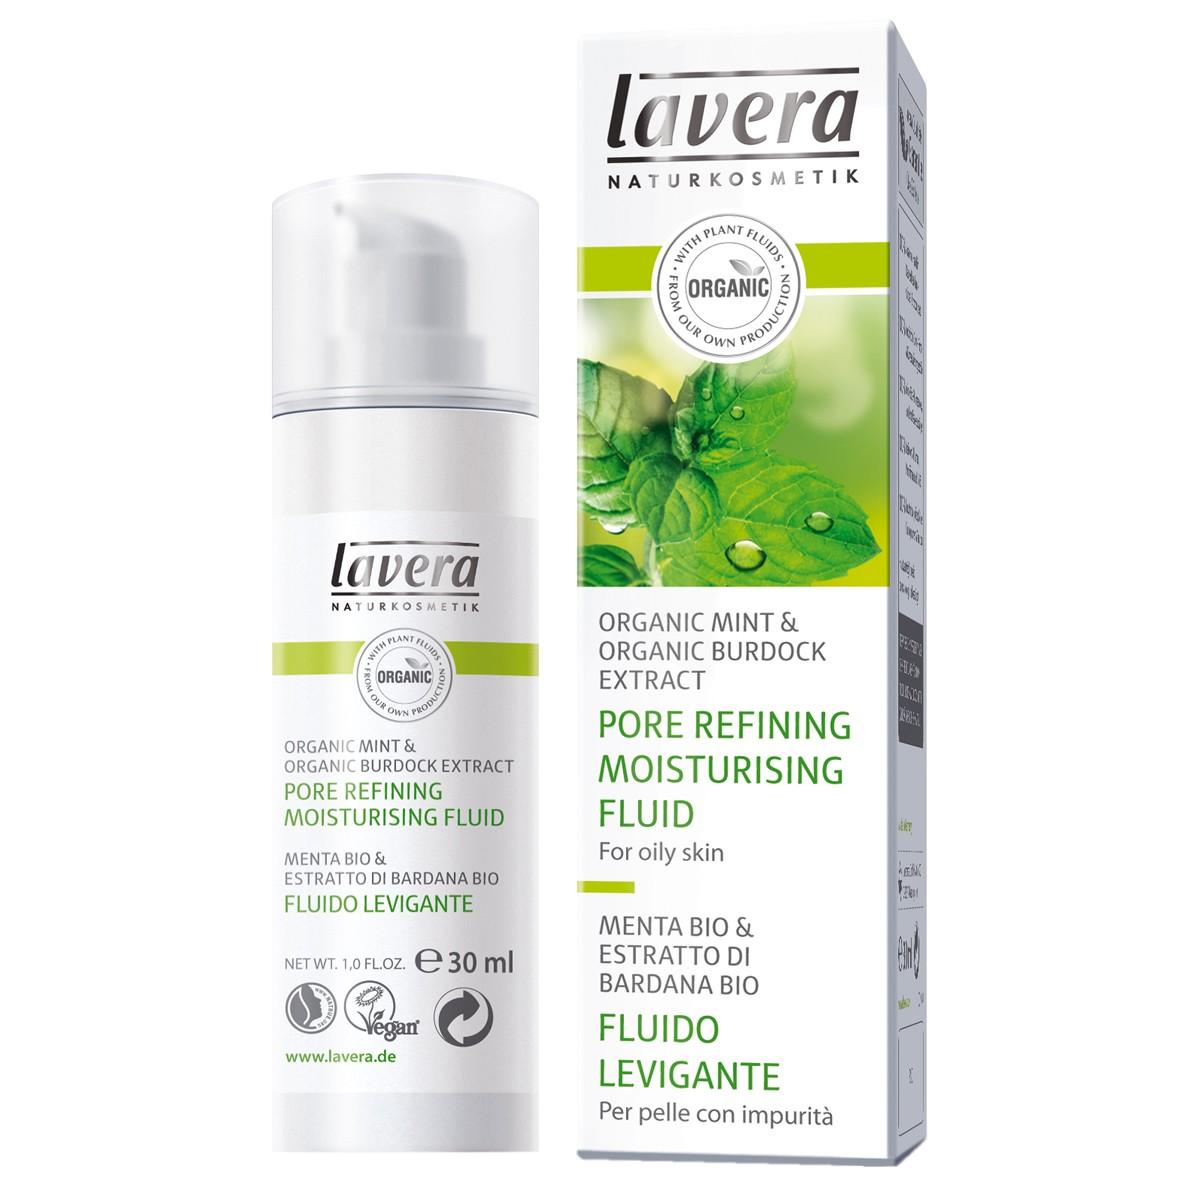 Lavera Mint Organic Pore Refining Moisturising Fluid